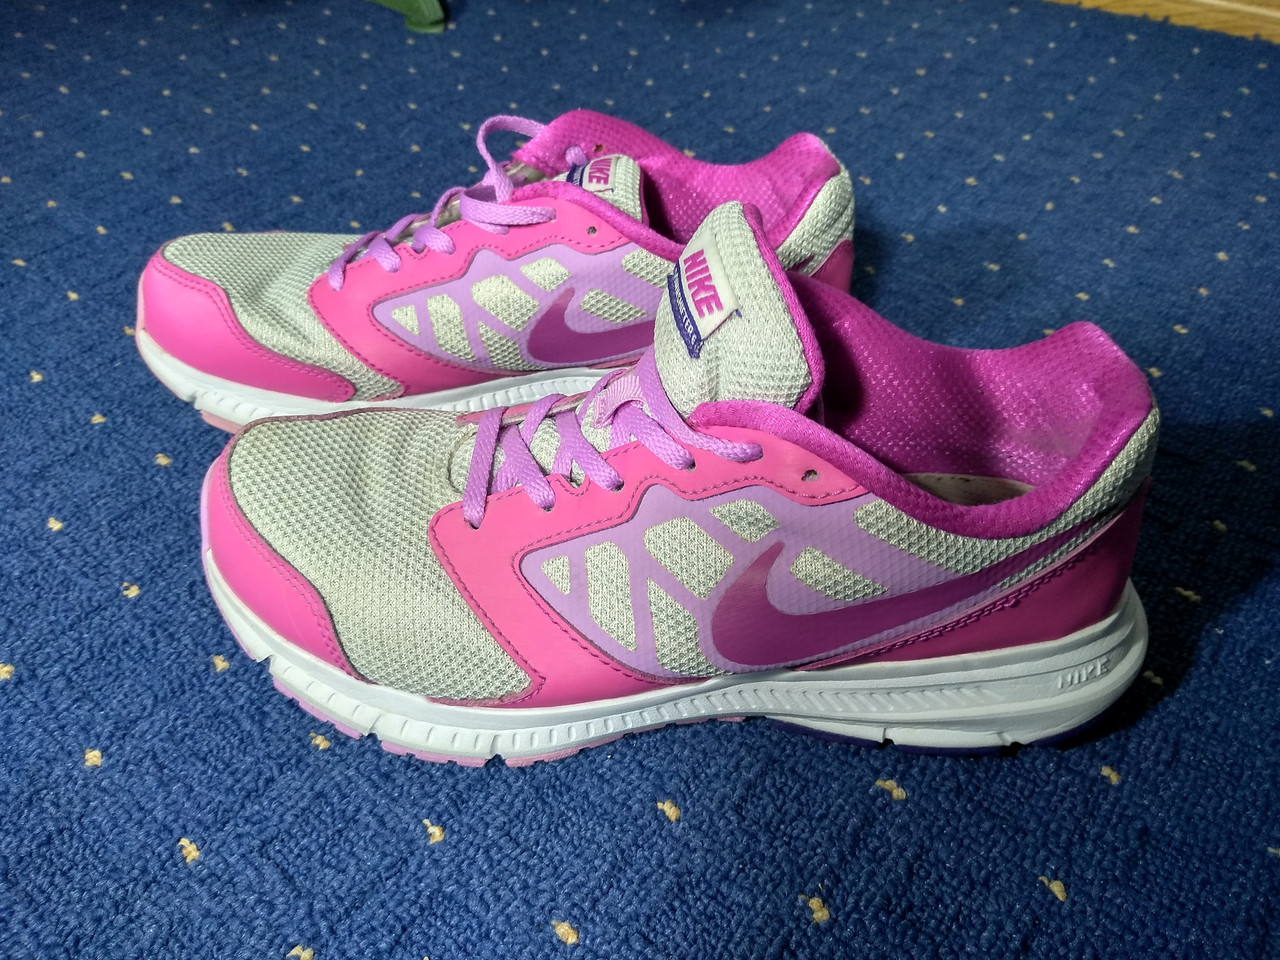 989ec165 Кроссовки Nike Downshifter 6 (37,5 размер) бу, цена 650 грн., купить ...